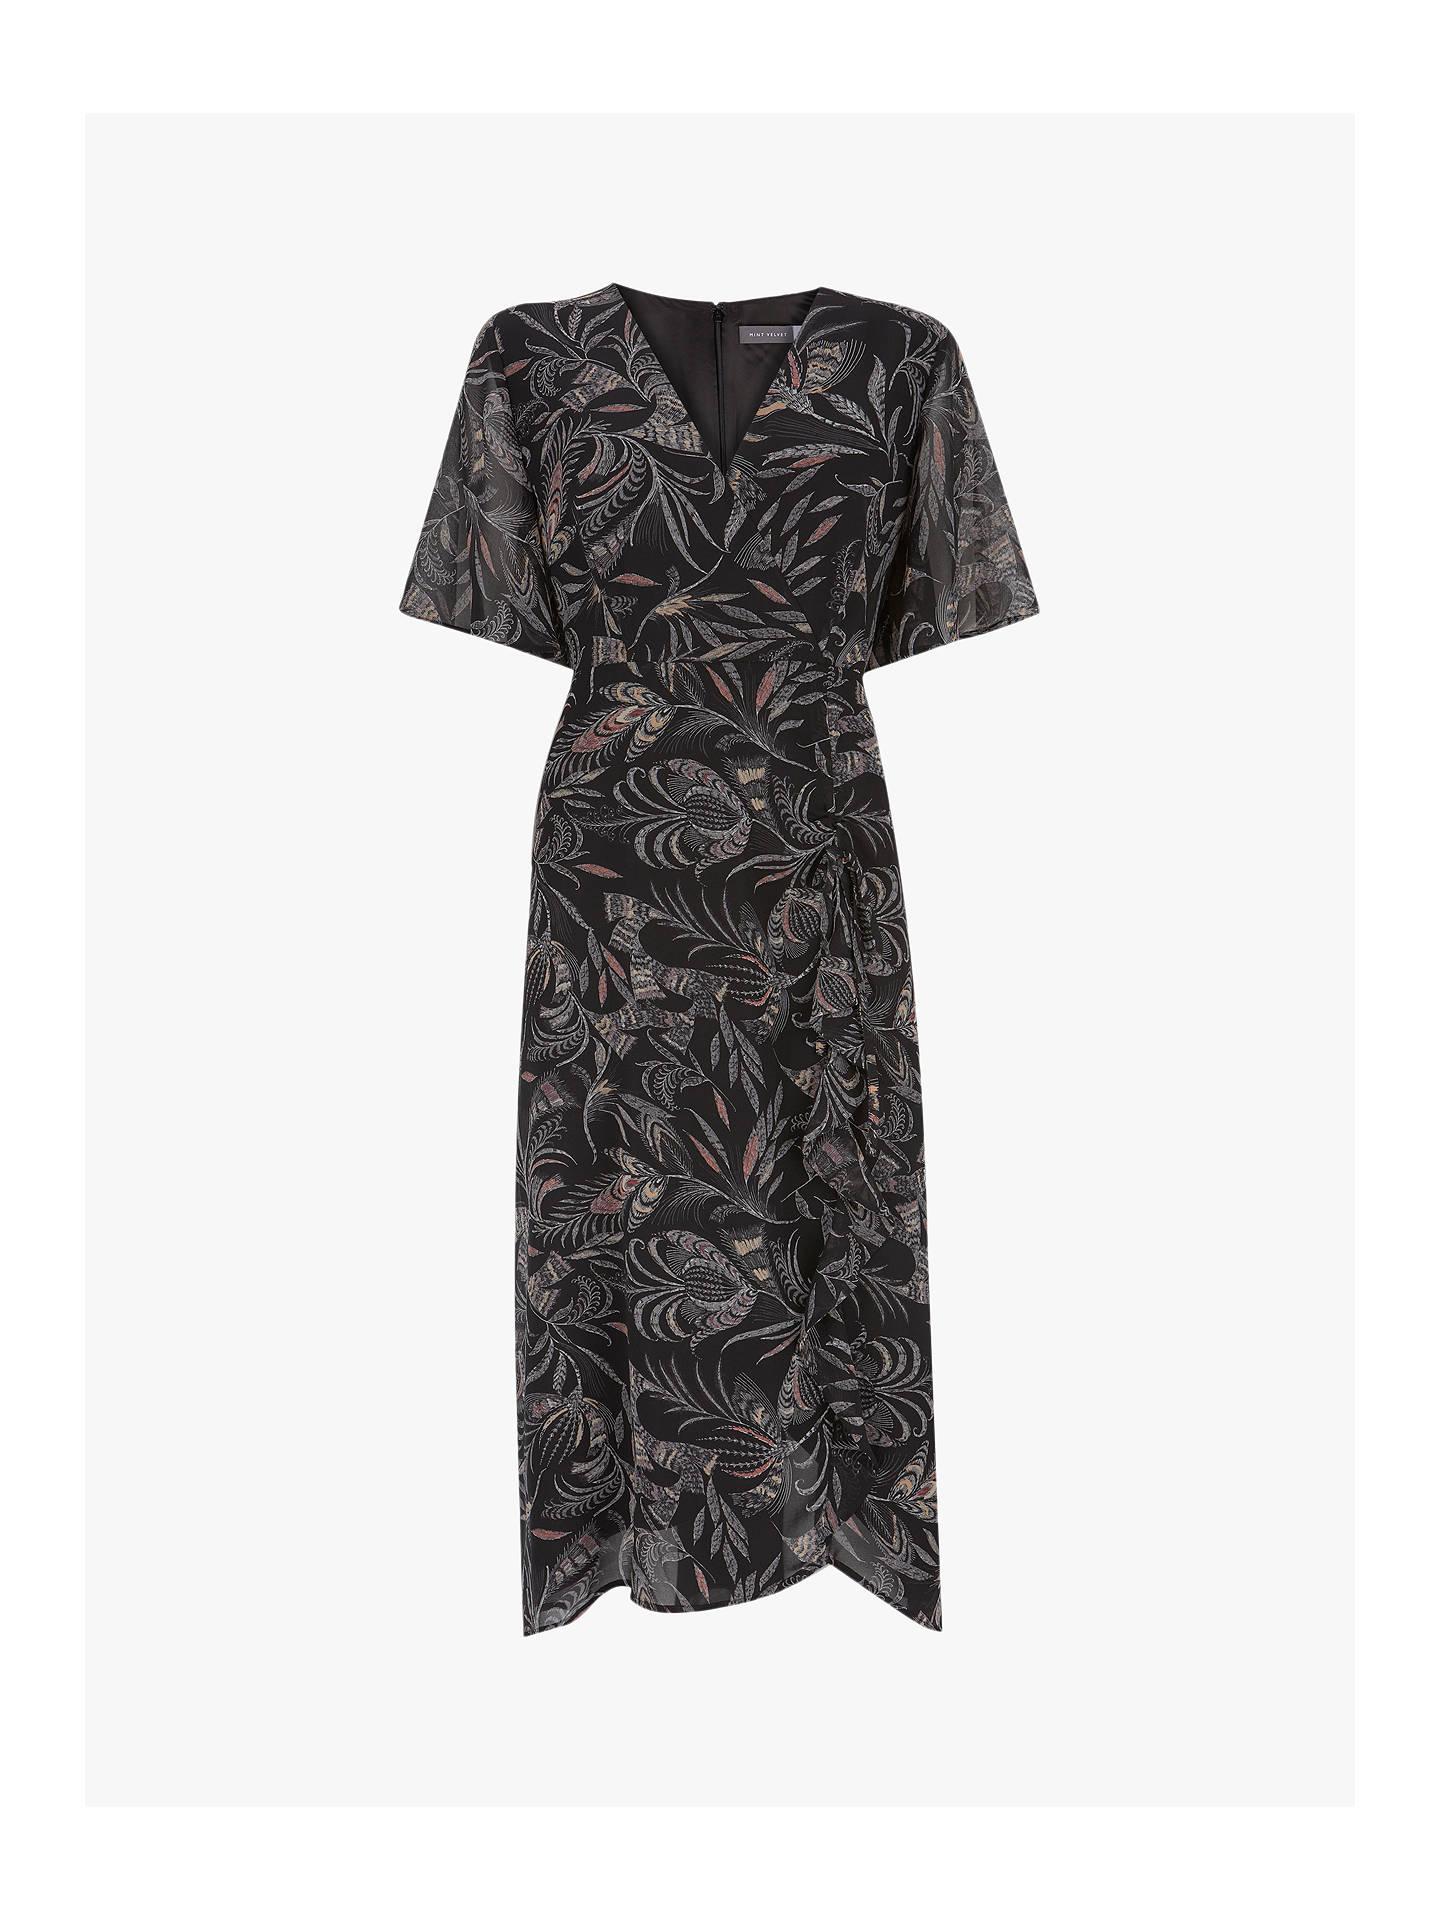 cfab70bccb49 ... Buy Mint Velvet Bella Print Ruched Dress, Multi, 6 Online at  johnlewis.com ...